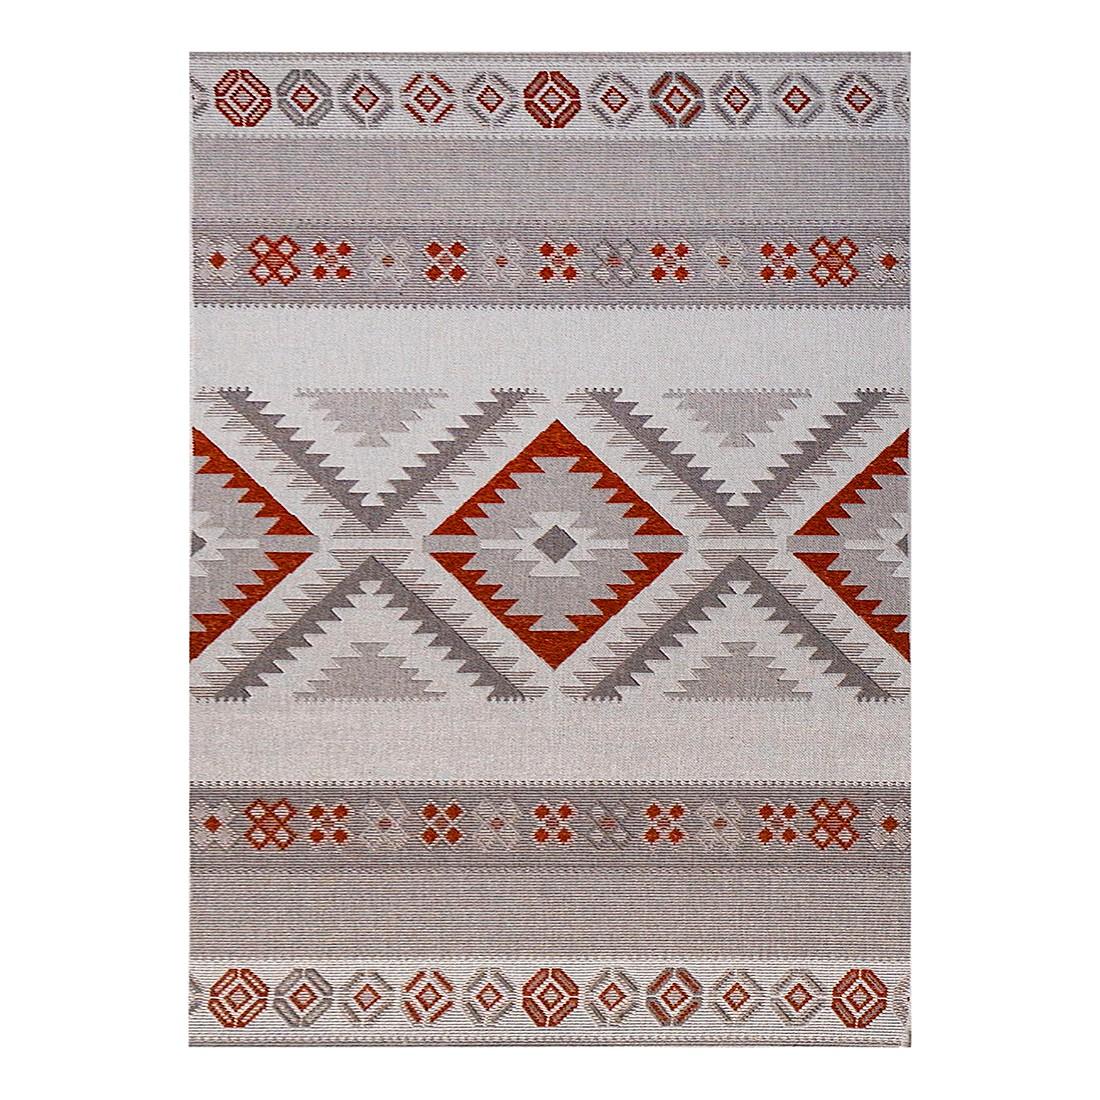 flachgewebe teppich kelim grau 160 x 230 cm hanse home collection g nstig bestellen. Black Bedroom Furniture Sets. Home Design Ideas